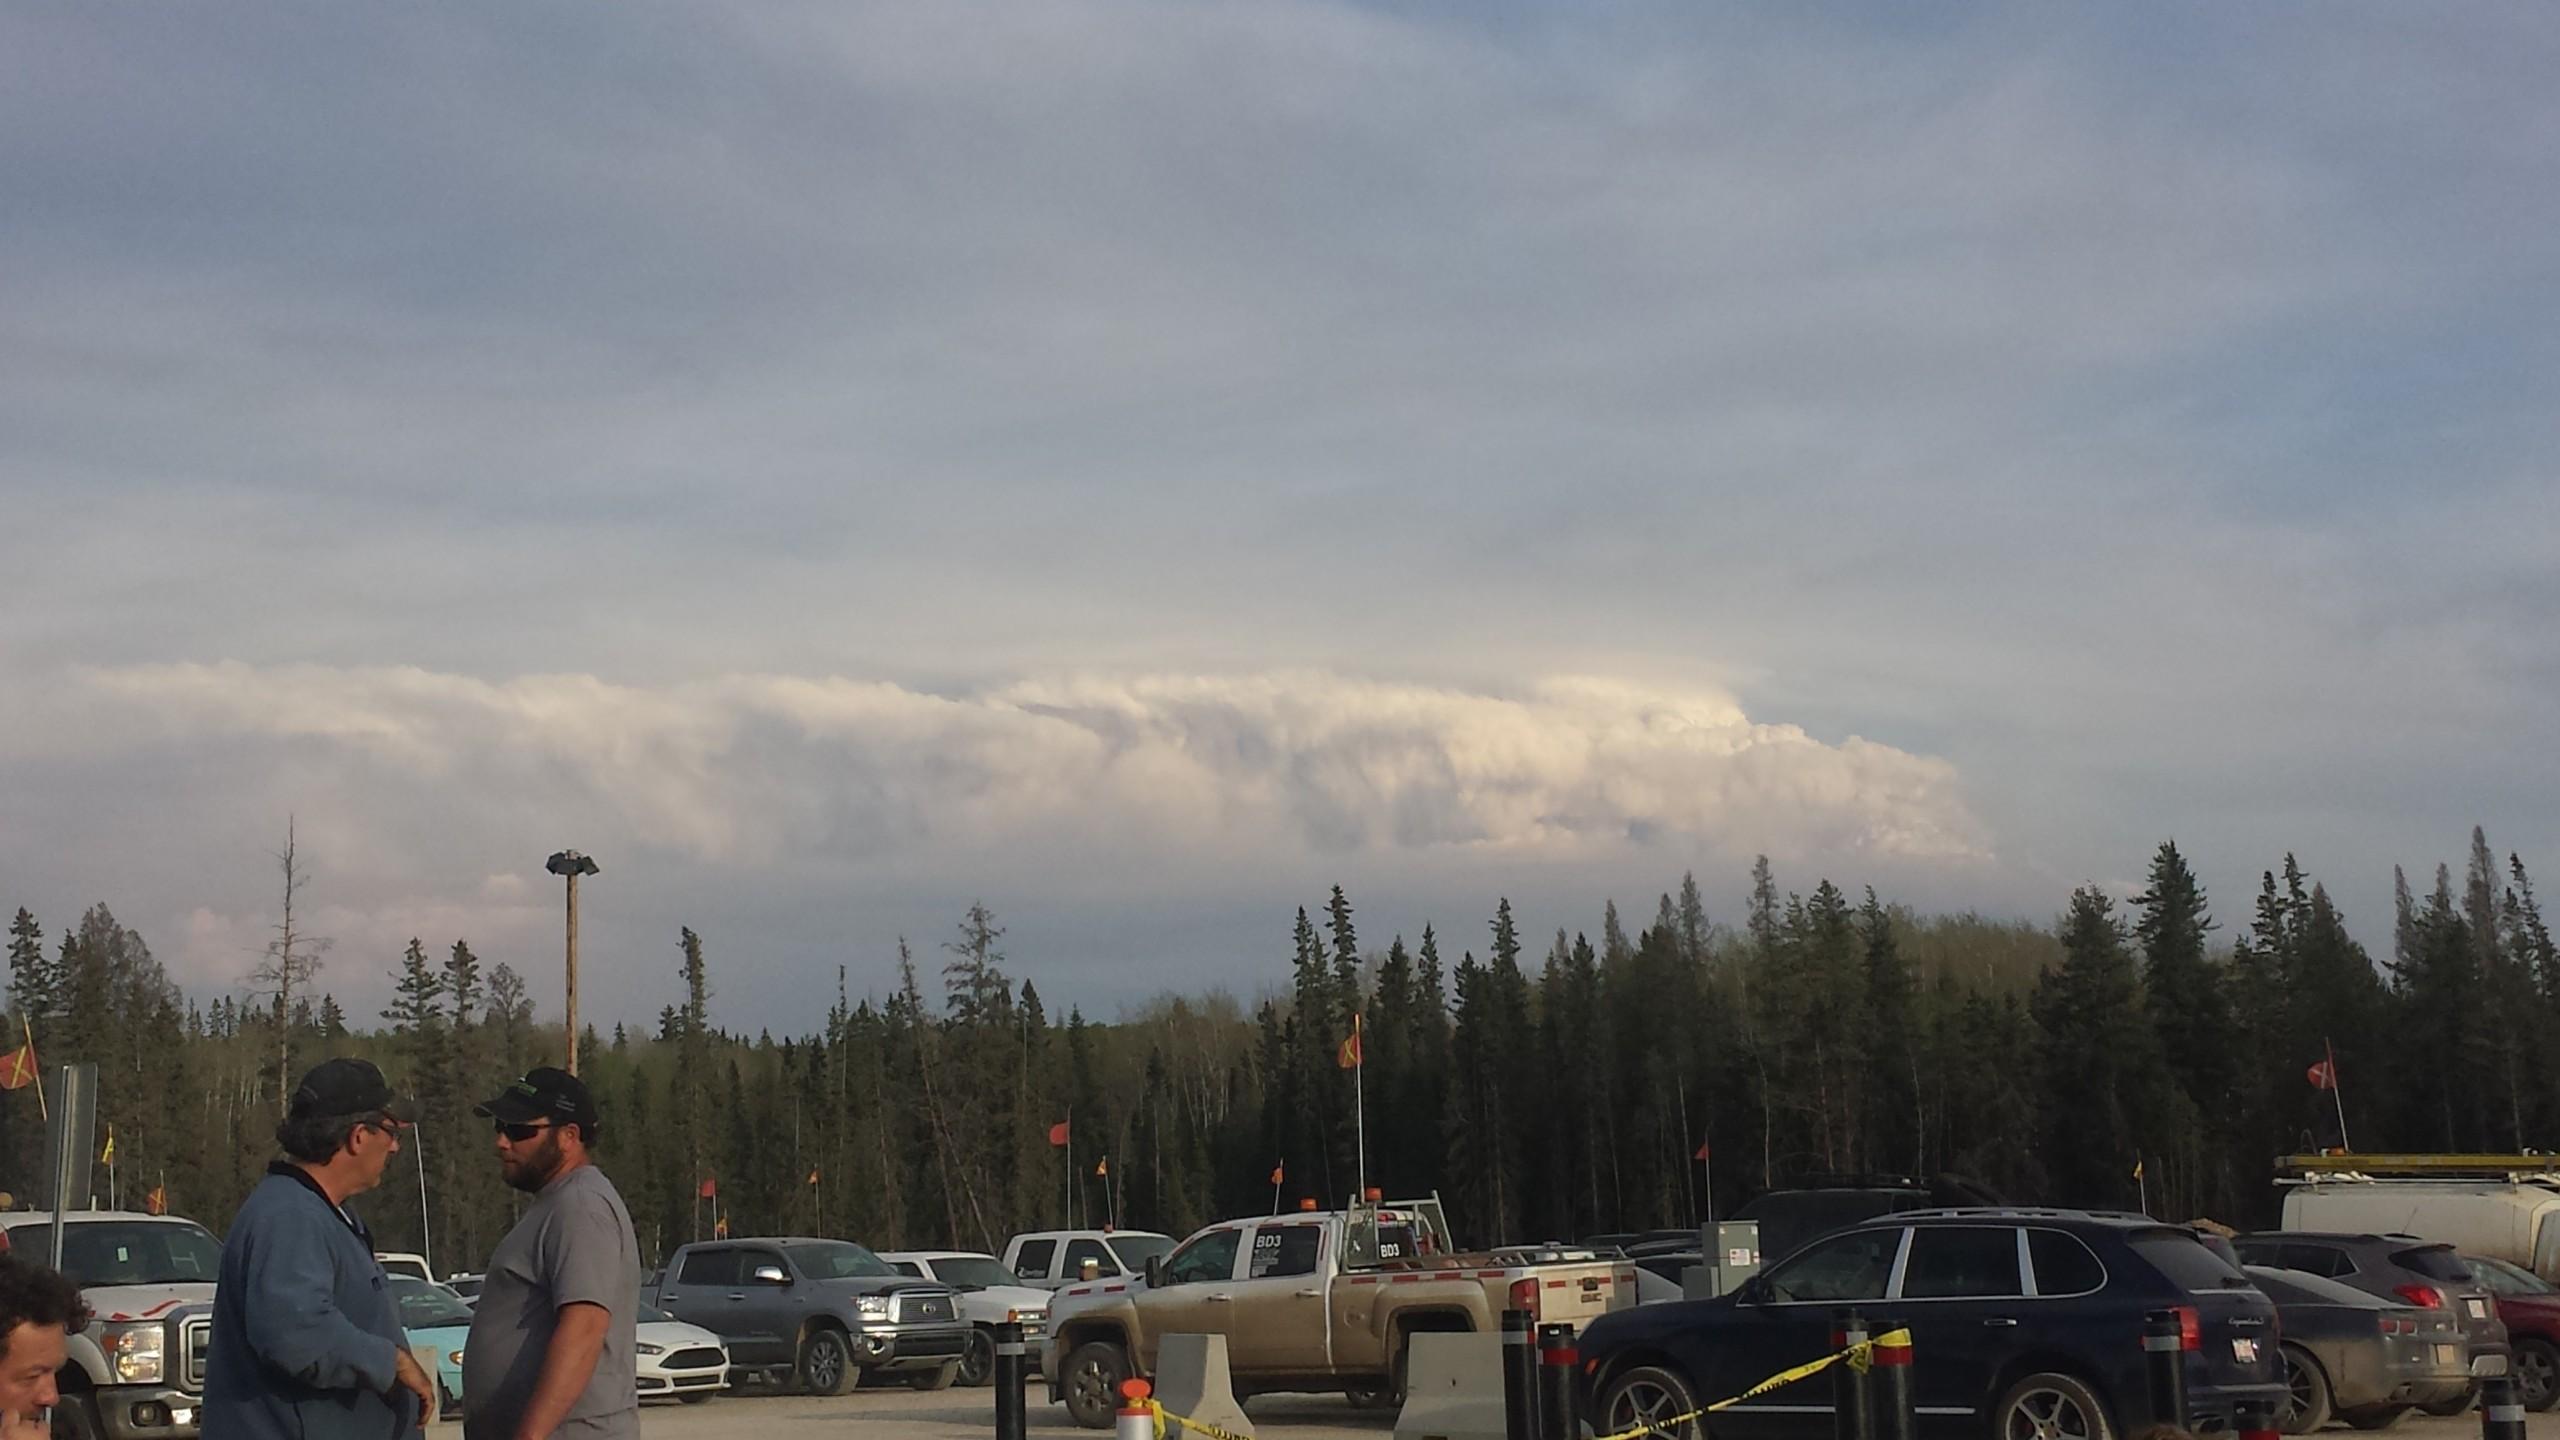 Anzac, Fort McMurray First Nation, Gregoire Lake Estates under MANDATORY evacuation